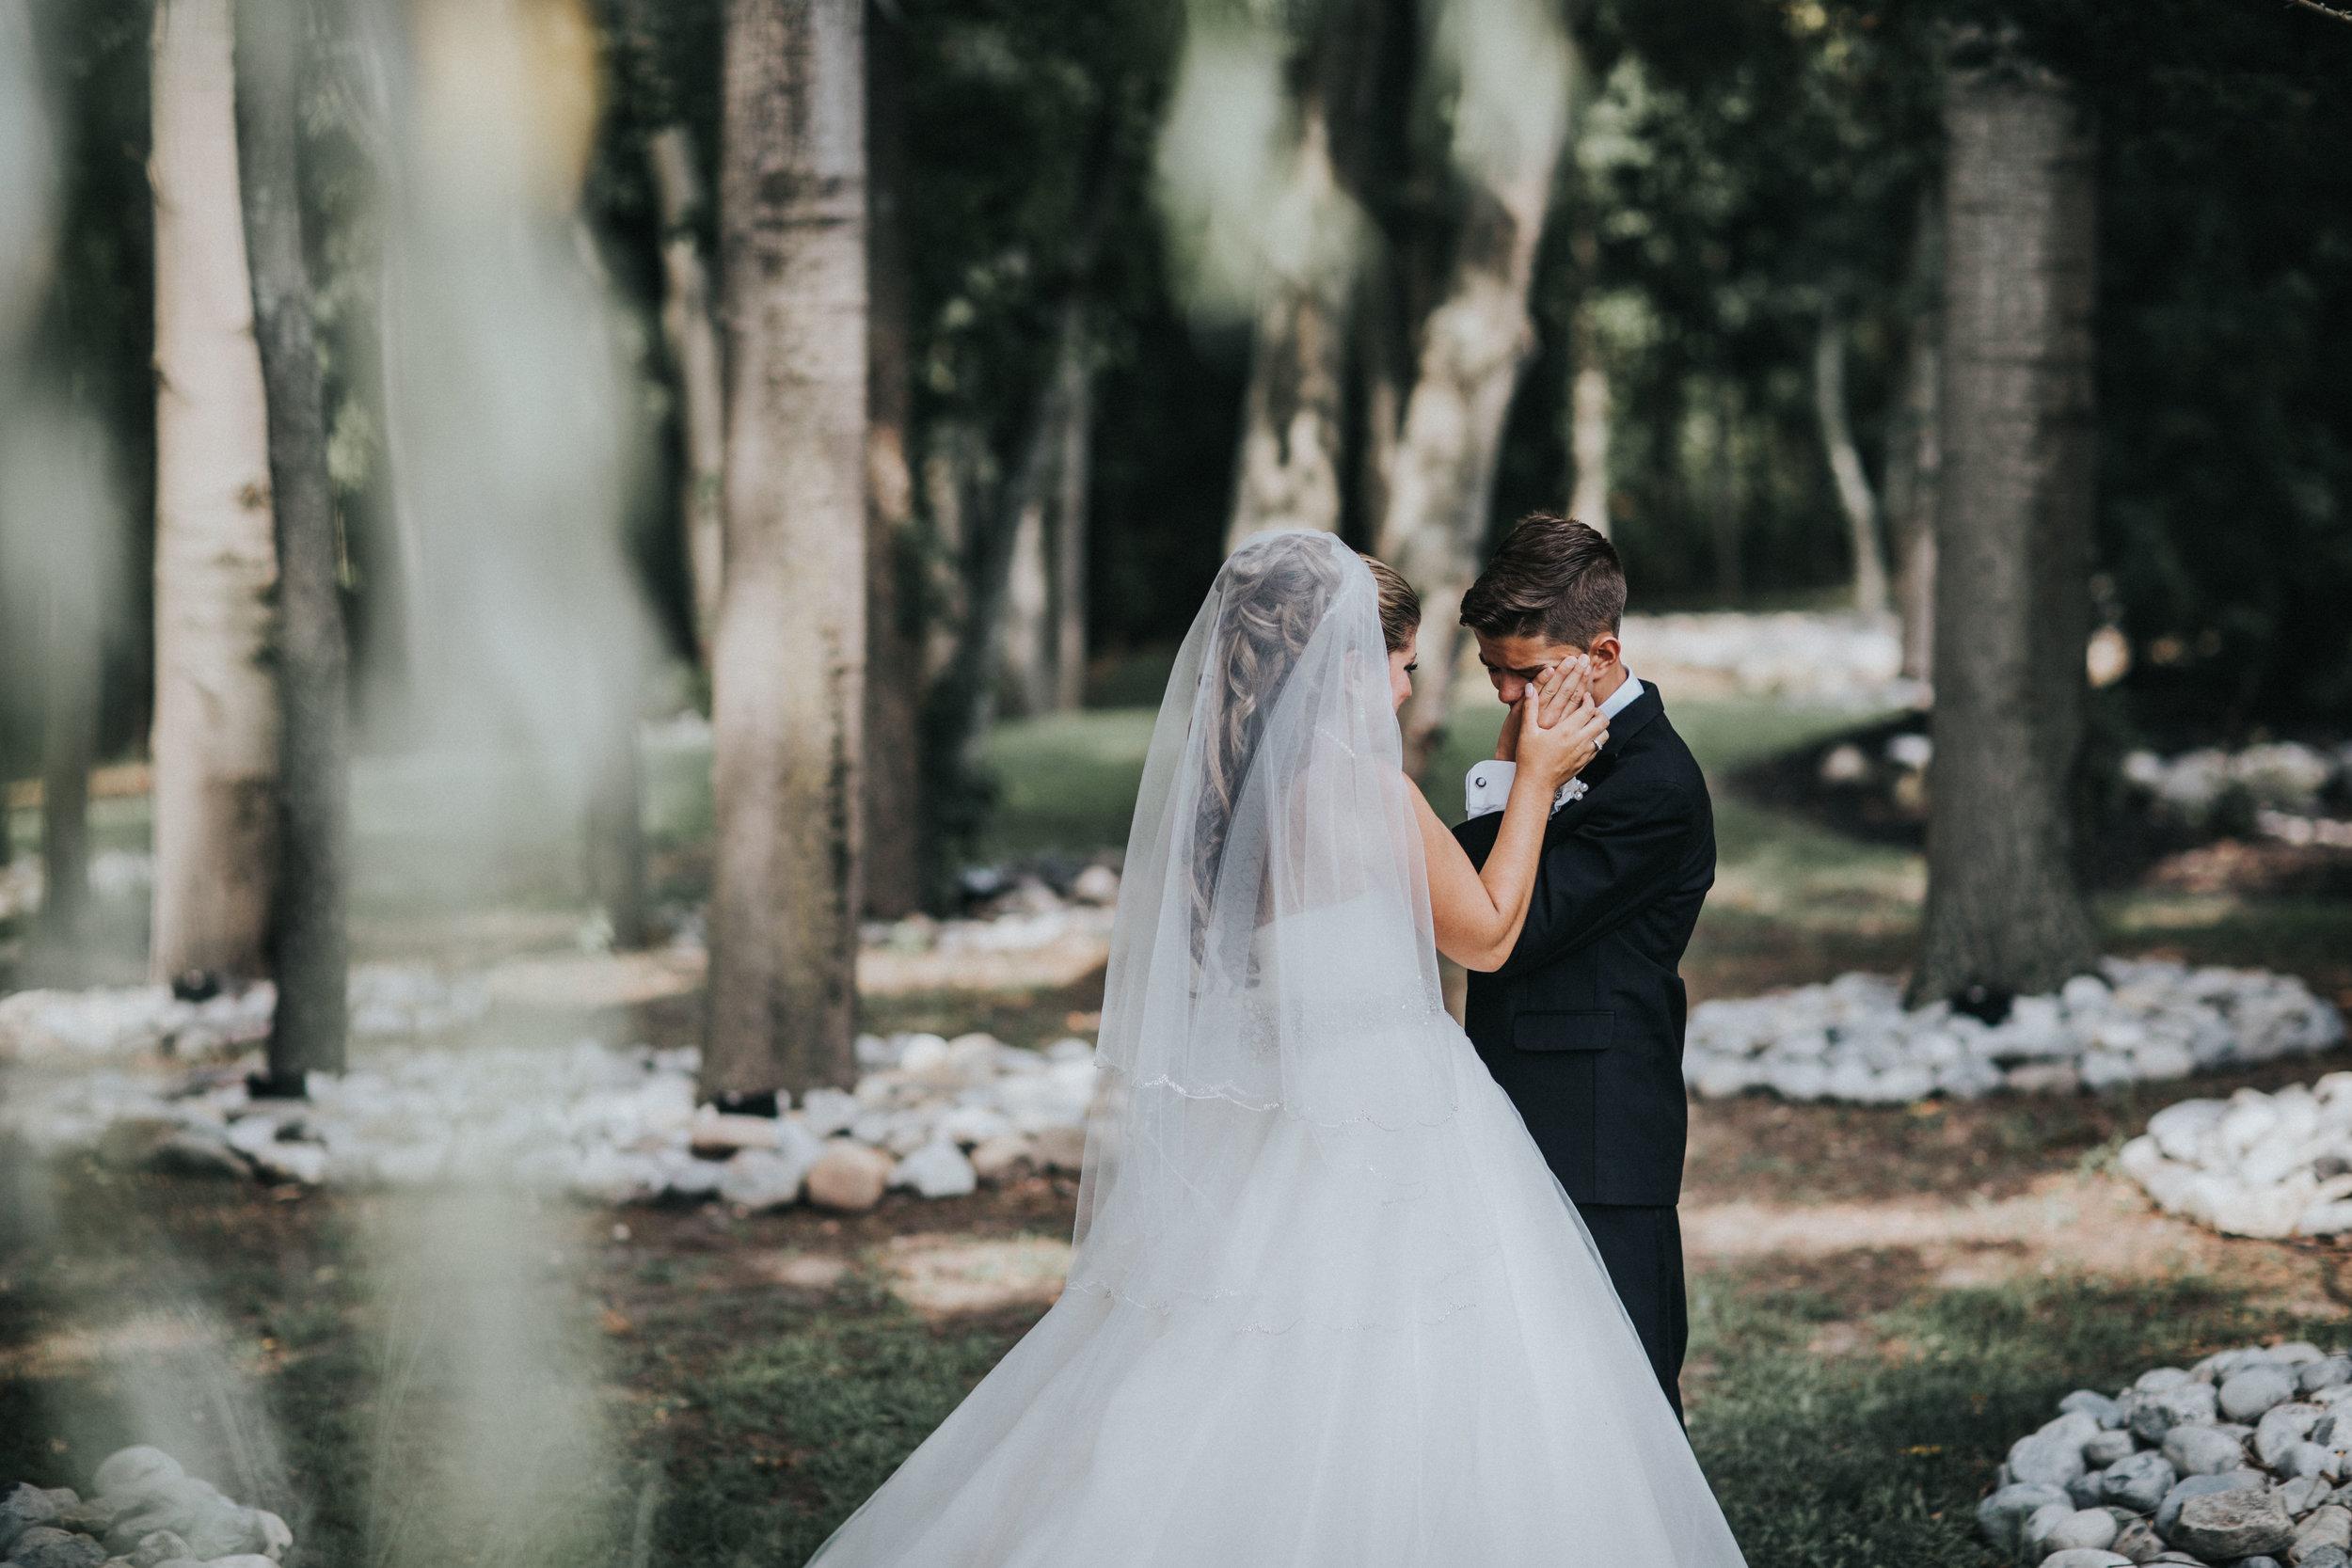 NewJersey_Wedding_Photography_Brigalias_First_Look_Tara&Pete-19.jpg